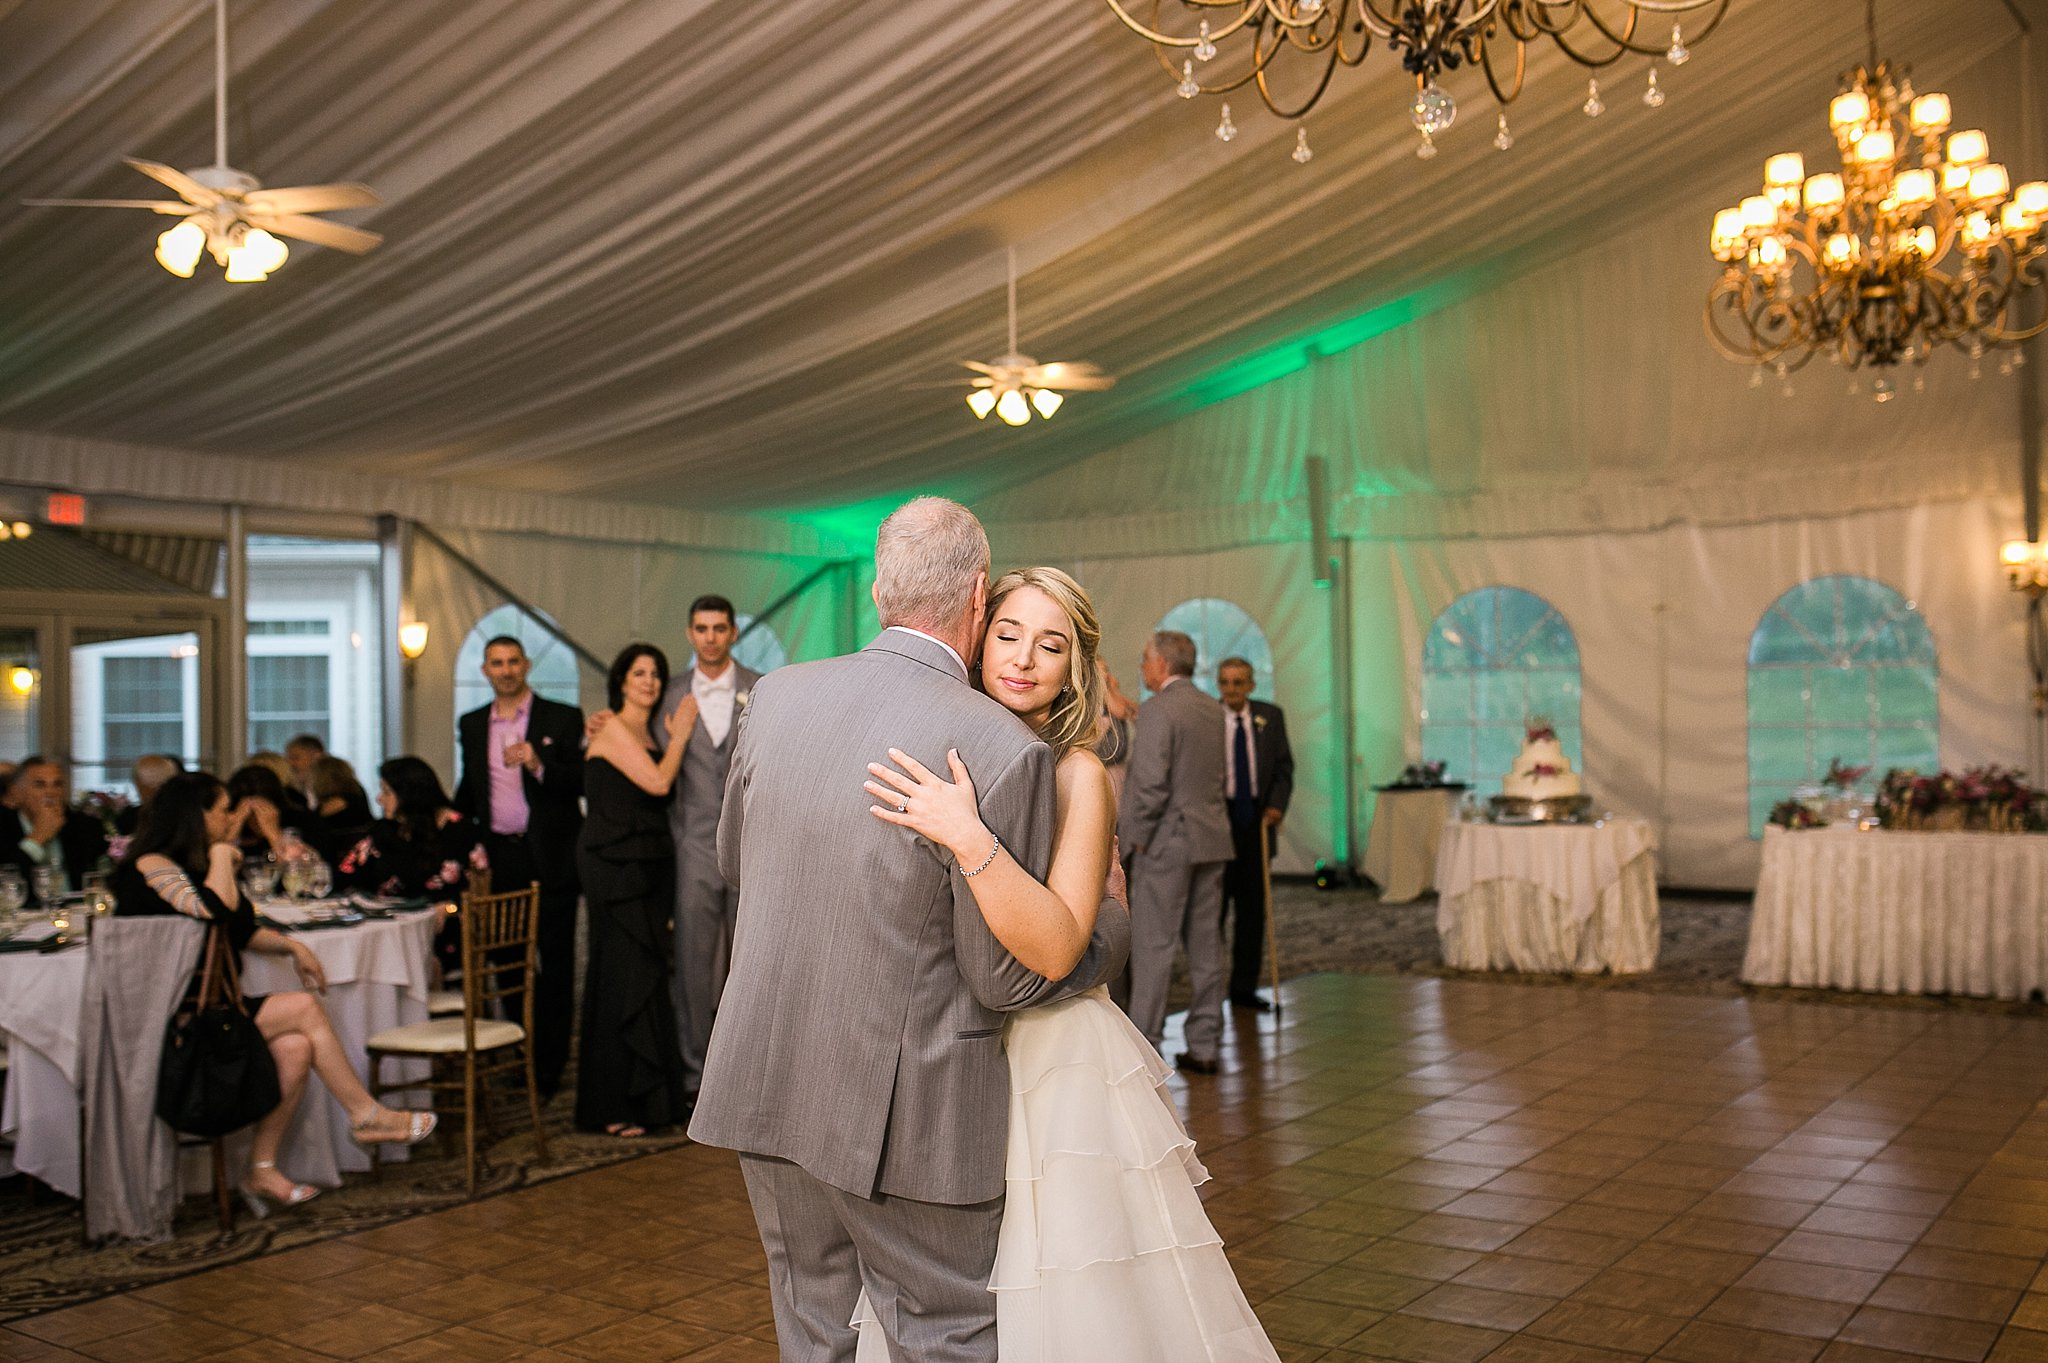 West Hills Country Club Wedding Hudson Valley Wedding Photographer Sweet Alice Photography 130.jpg